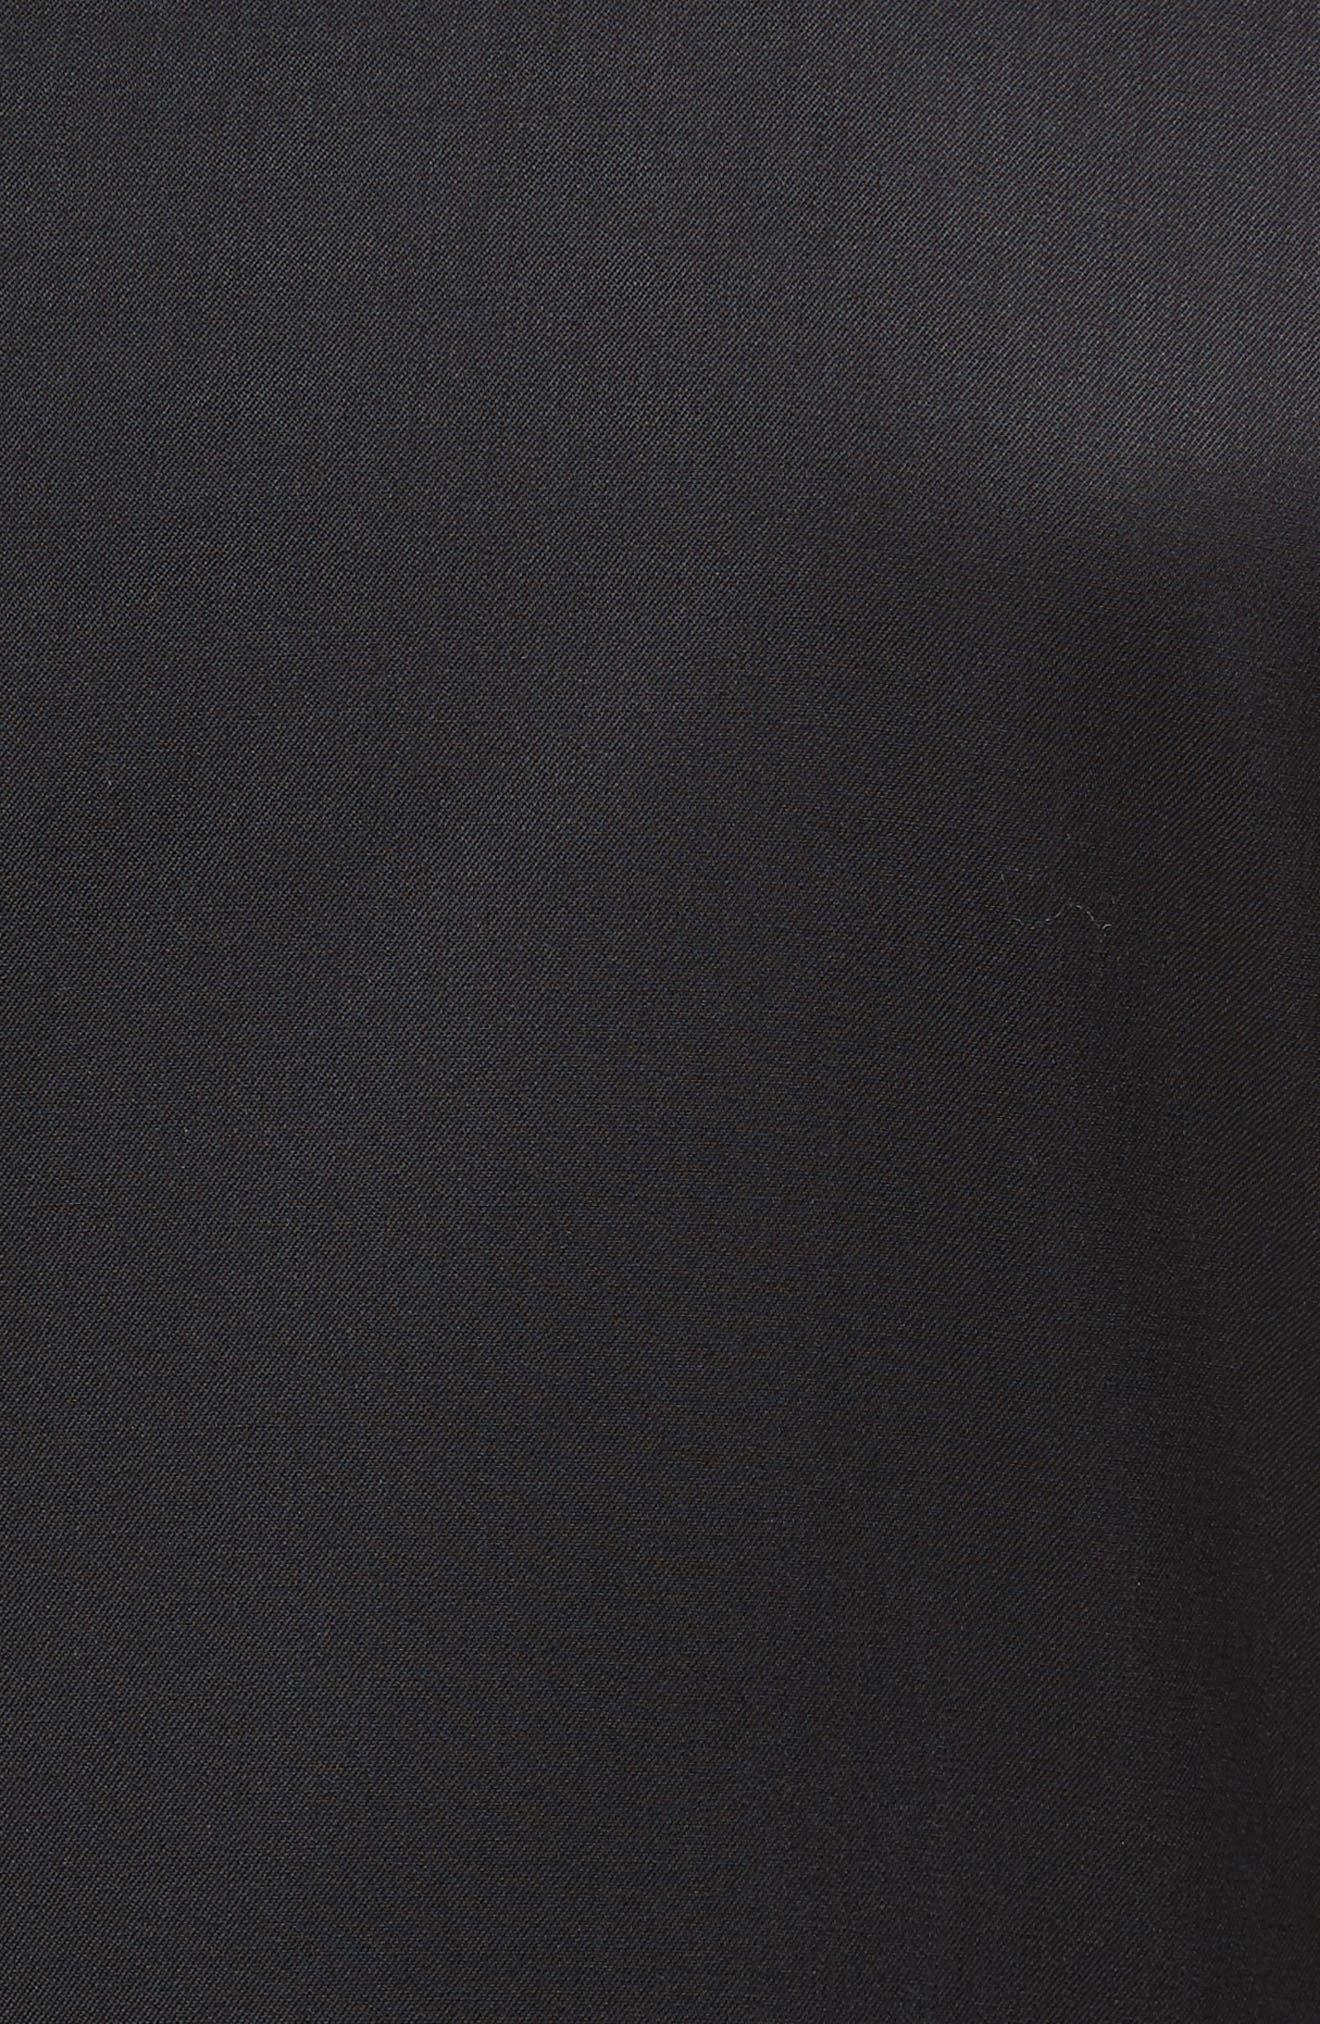 Josh Trim Fit Wool & Mohair Tuxedo,                             Alternate thumbnail 7, color,                             BLACK